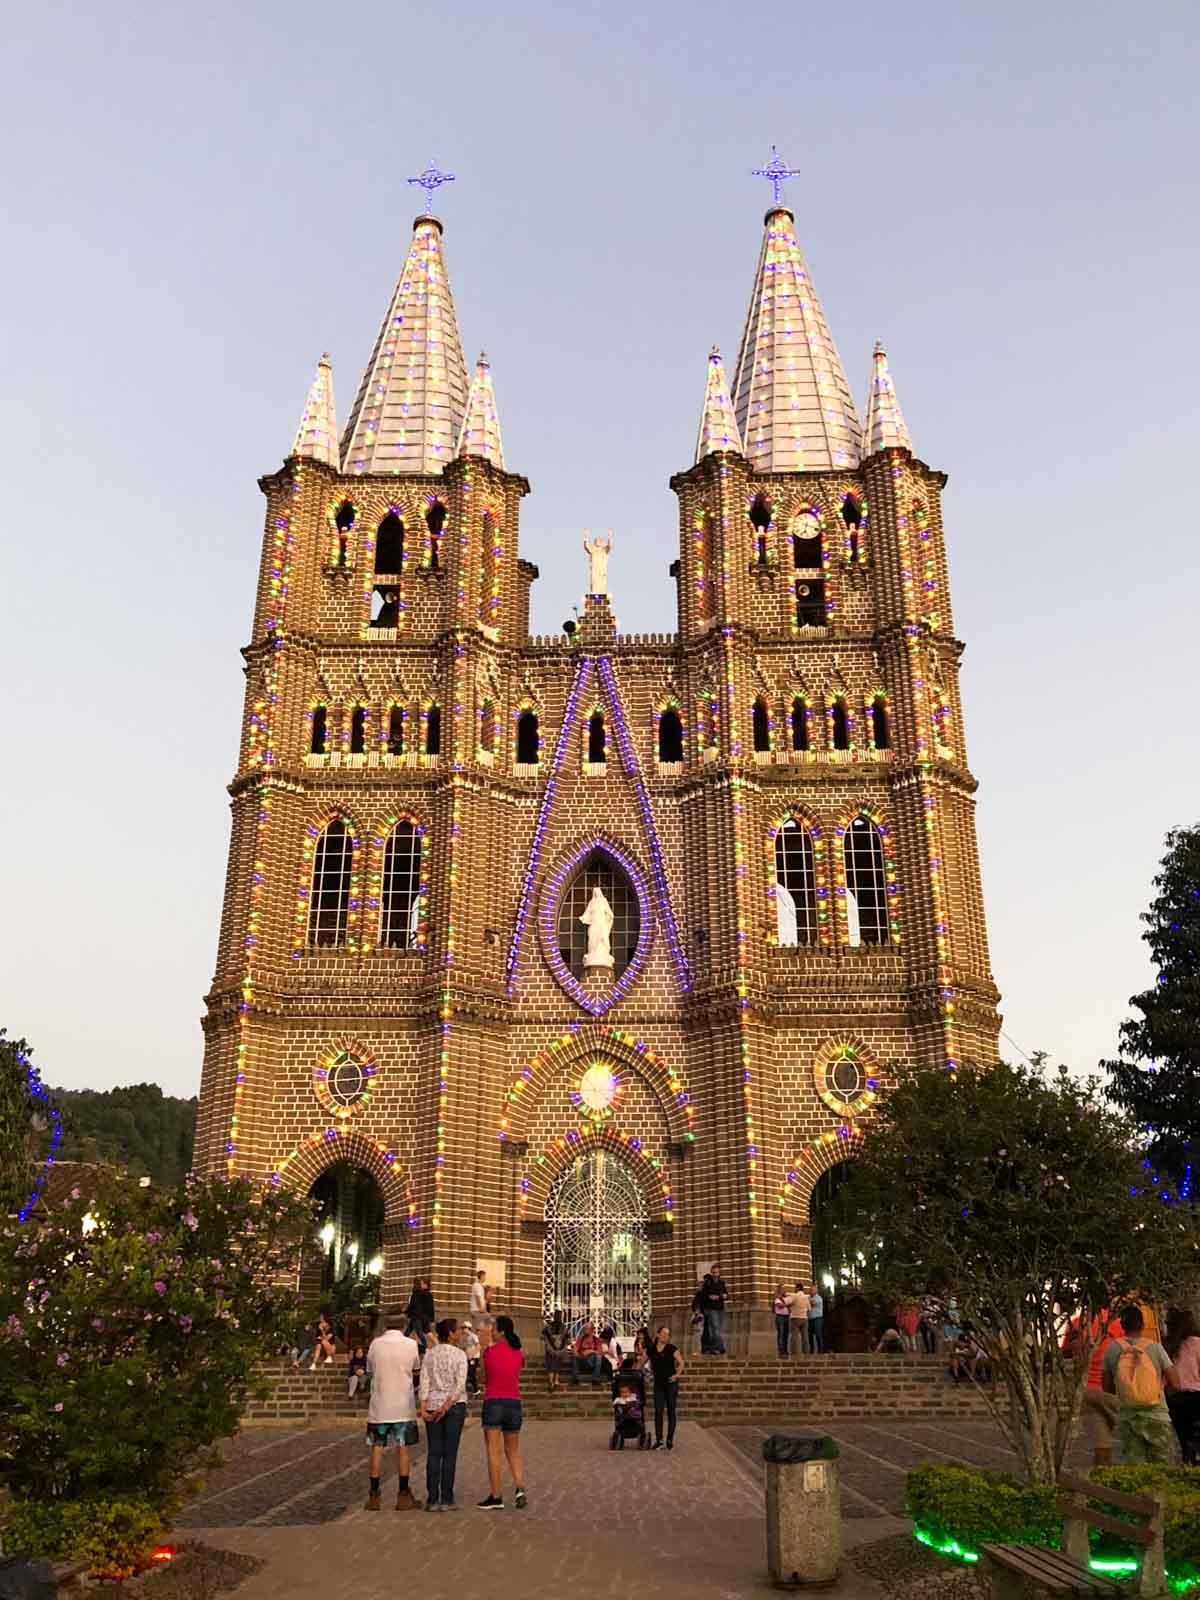 A church in Jardin, Colombia.